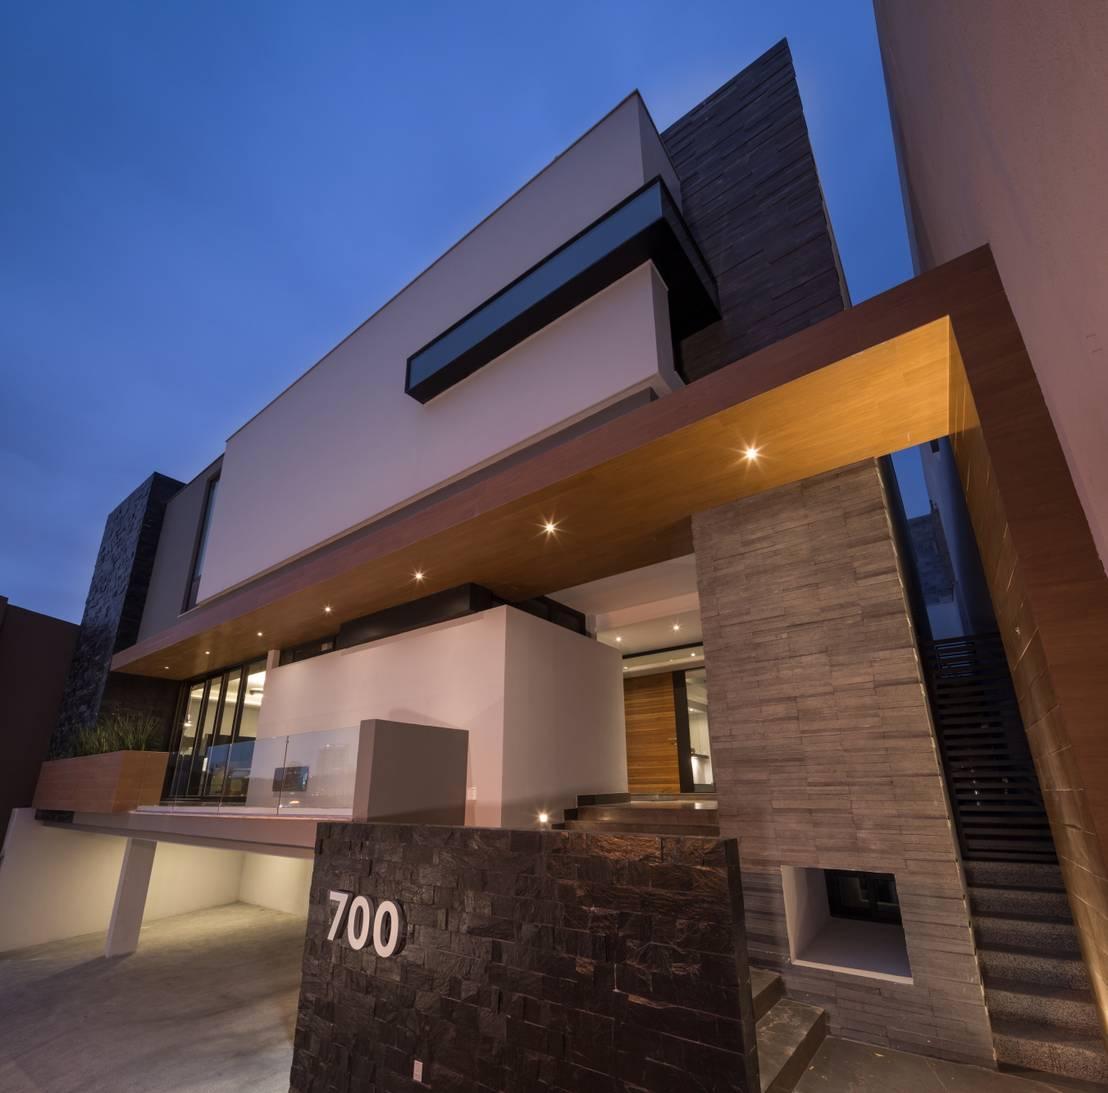 Escogimos 18 ideas de una casa fant stica - Casa fantastica ...